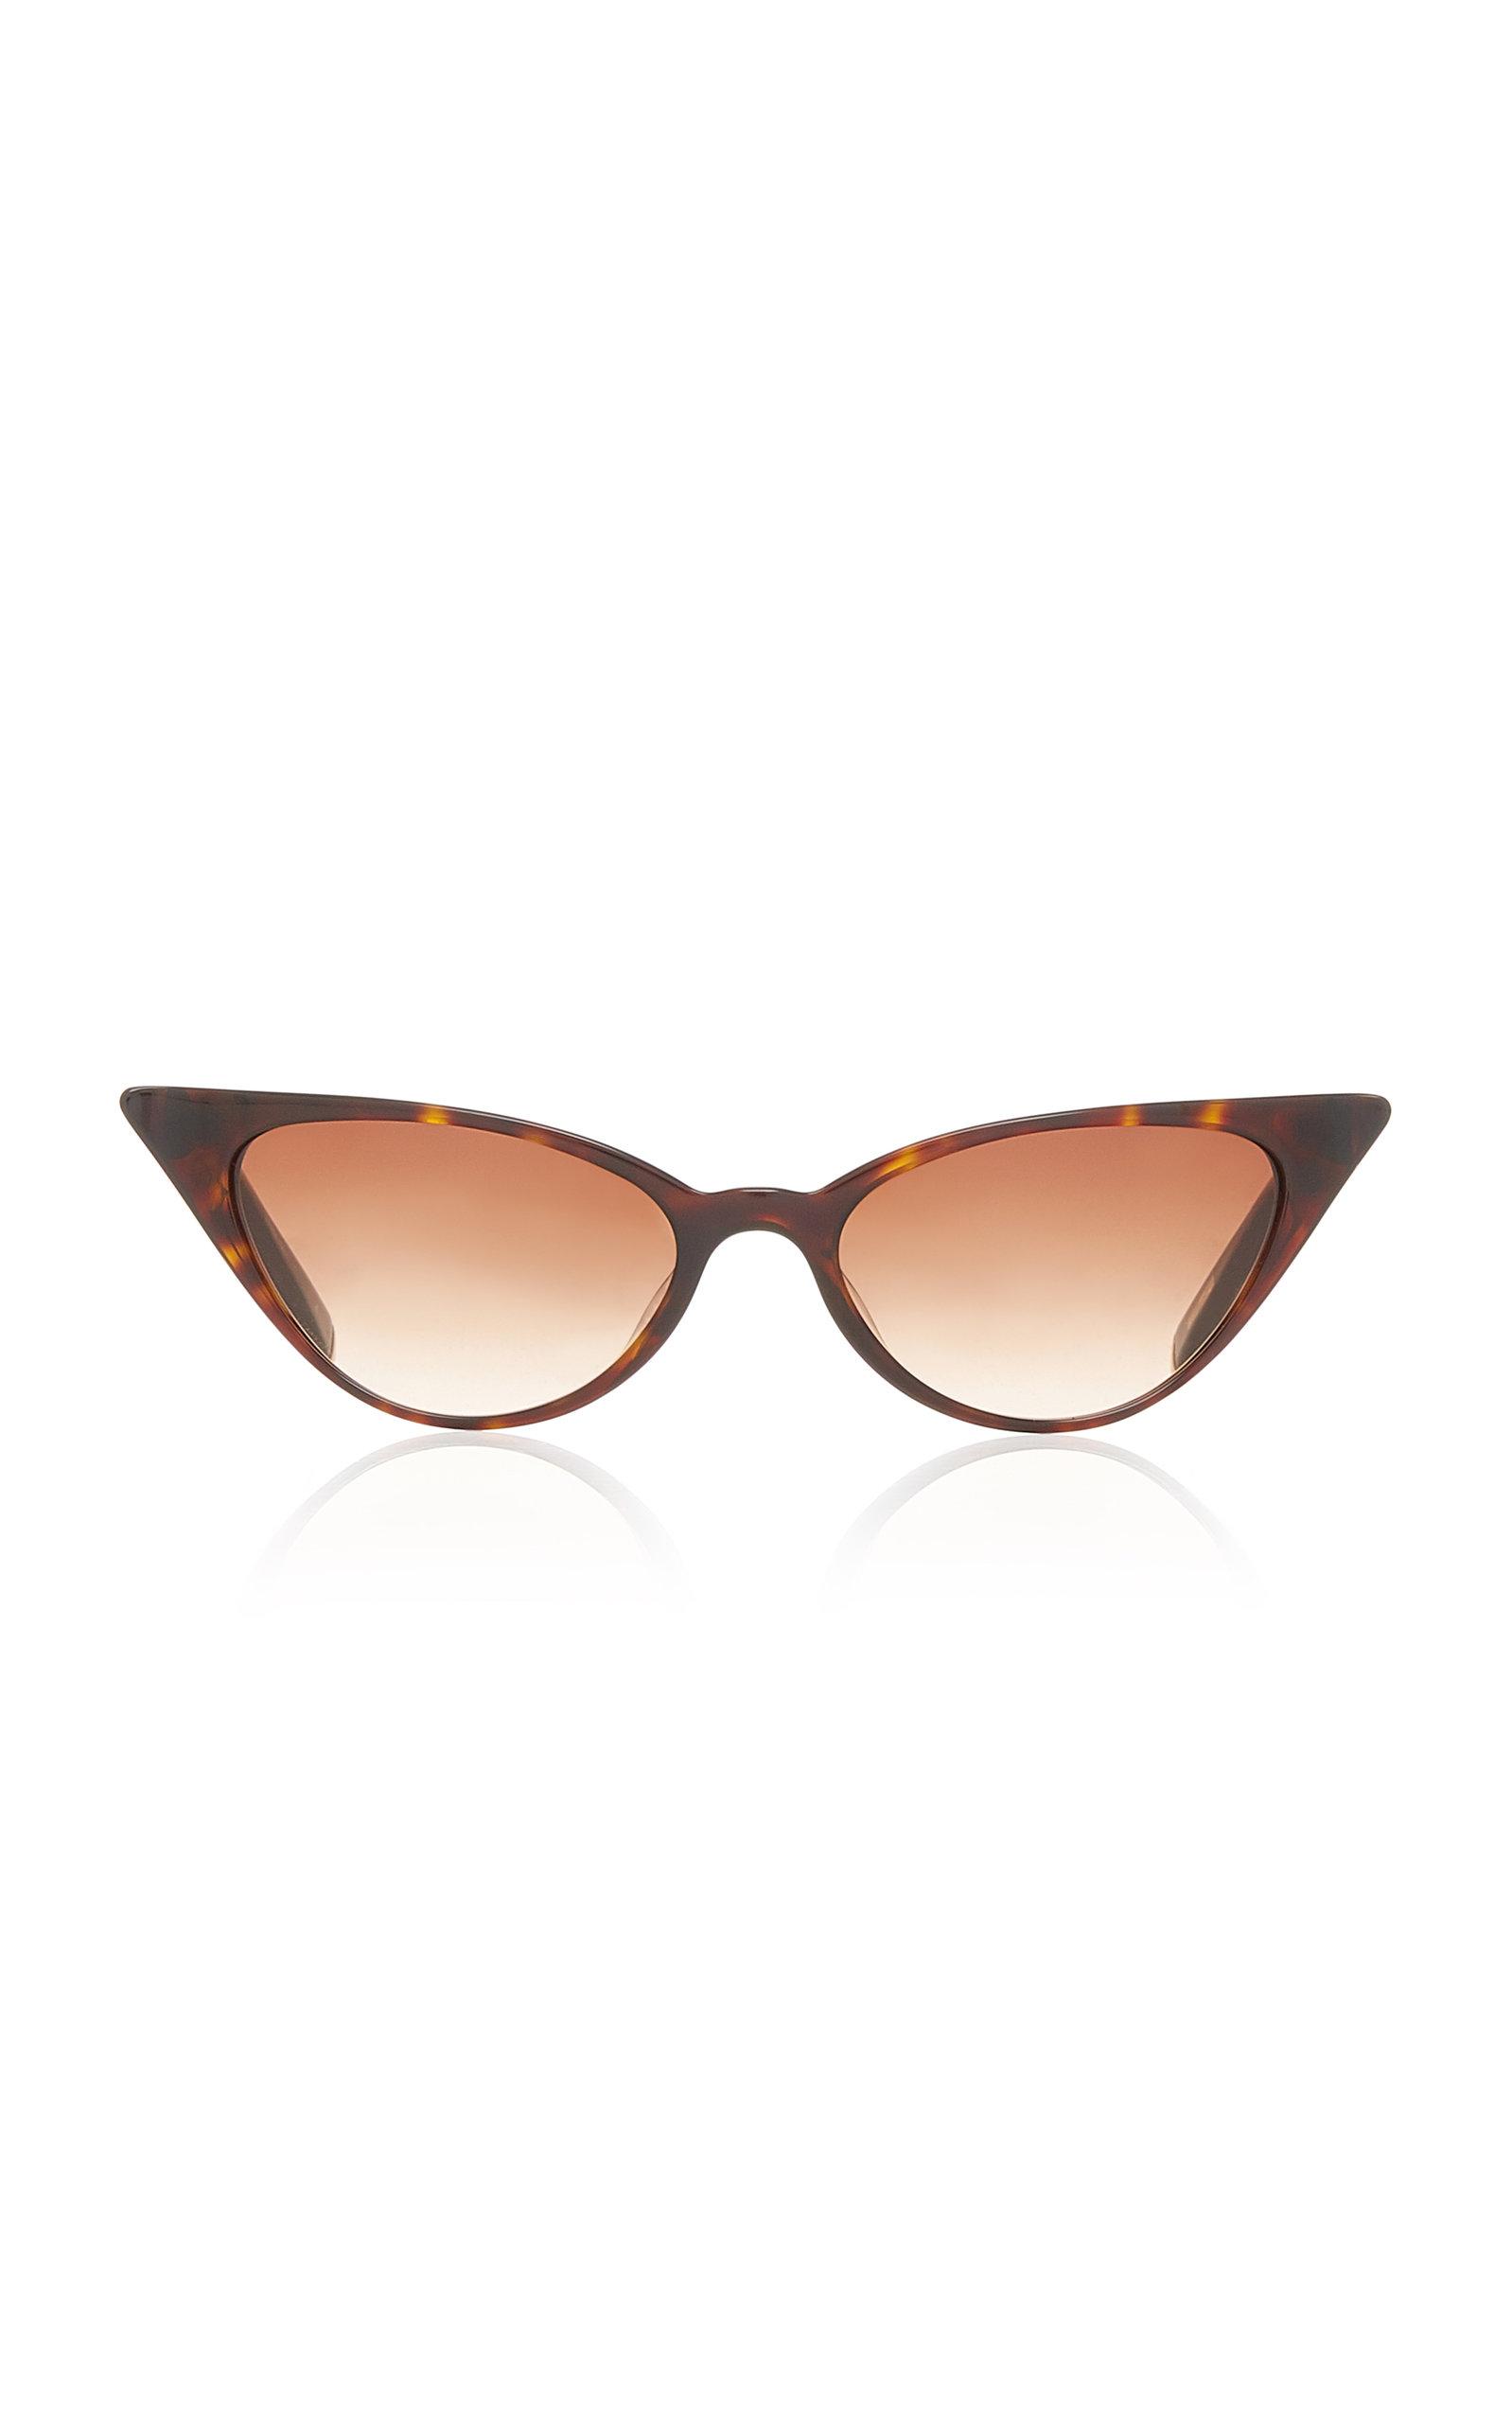 KATE YOUNG Lita Cat-Eye Sunglasses in Brown